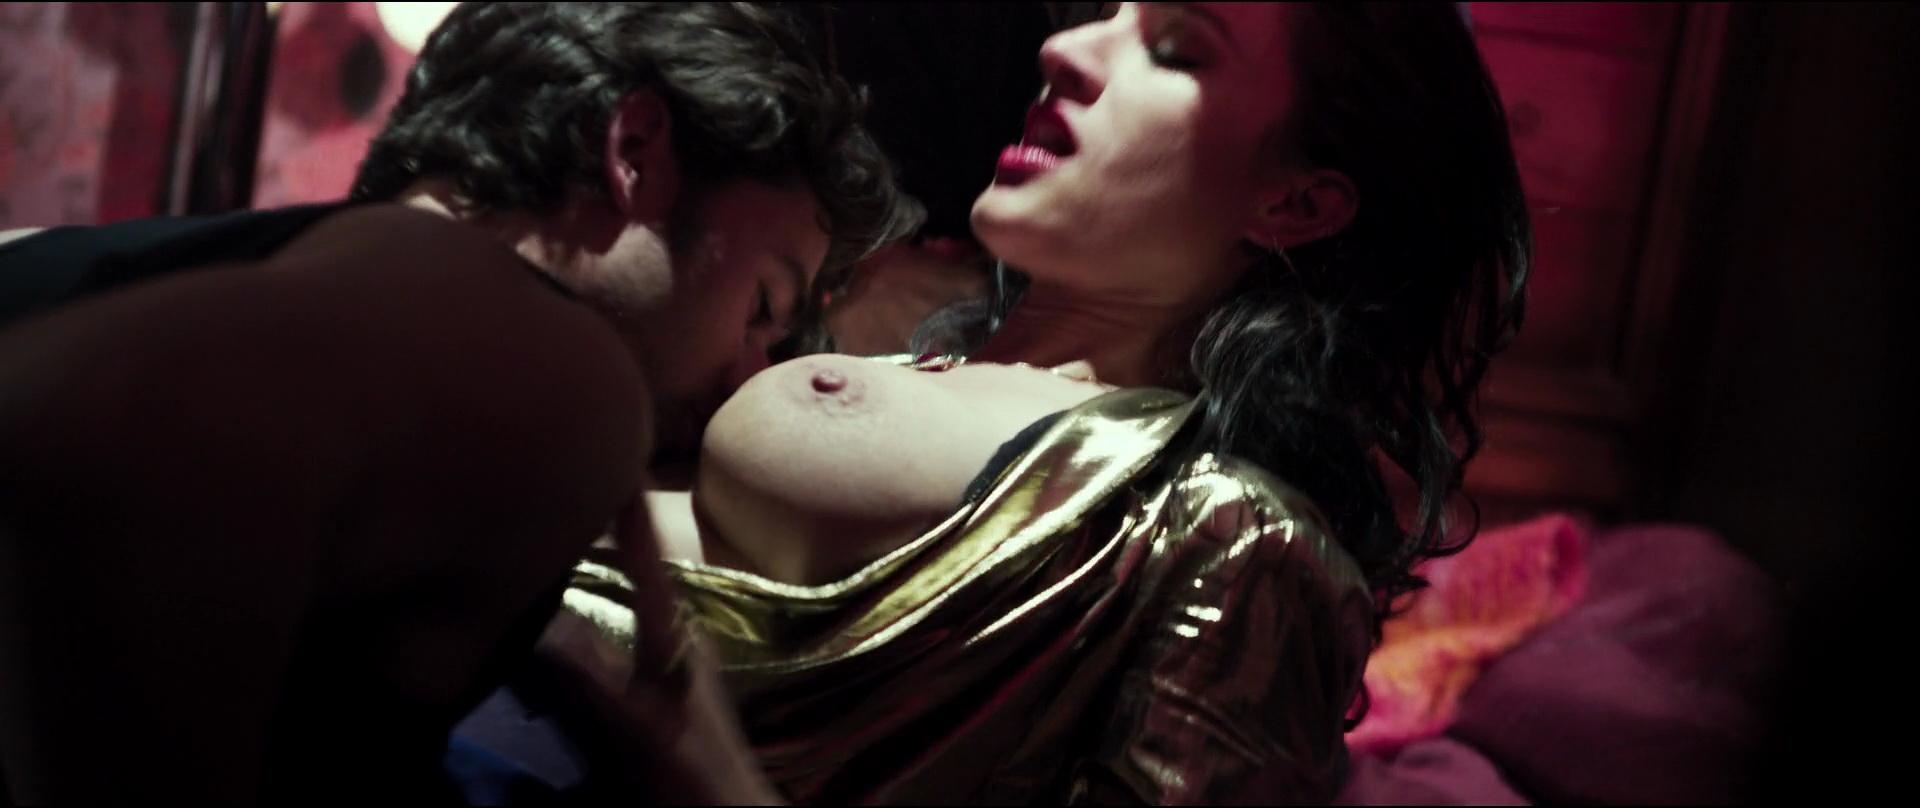 America Olivo Video Porno watch online - america olivo – maniac (2012) hd 1080p